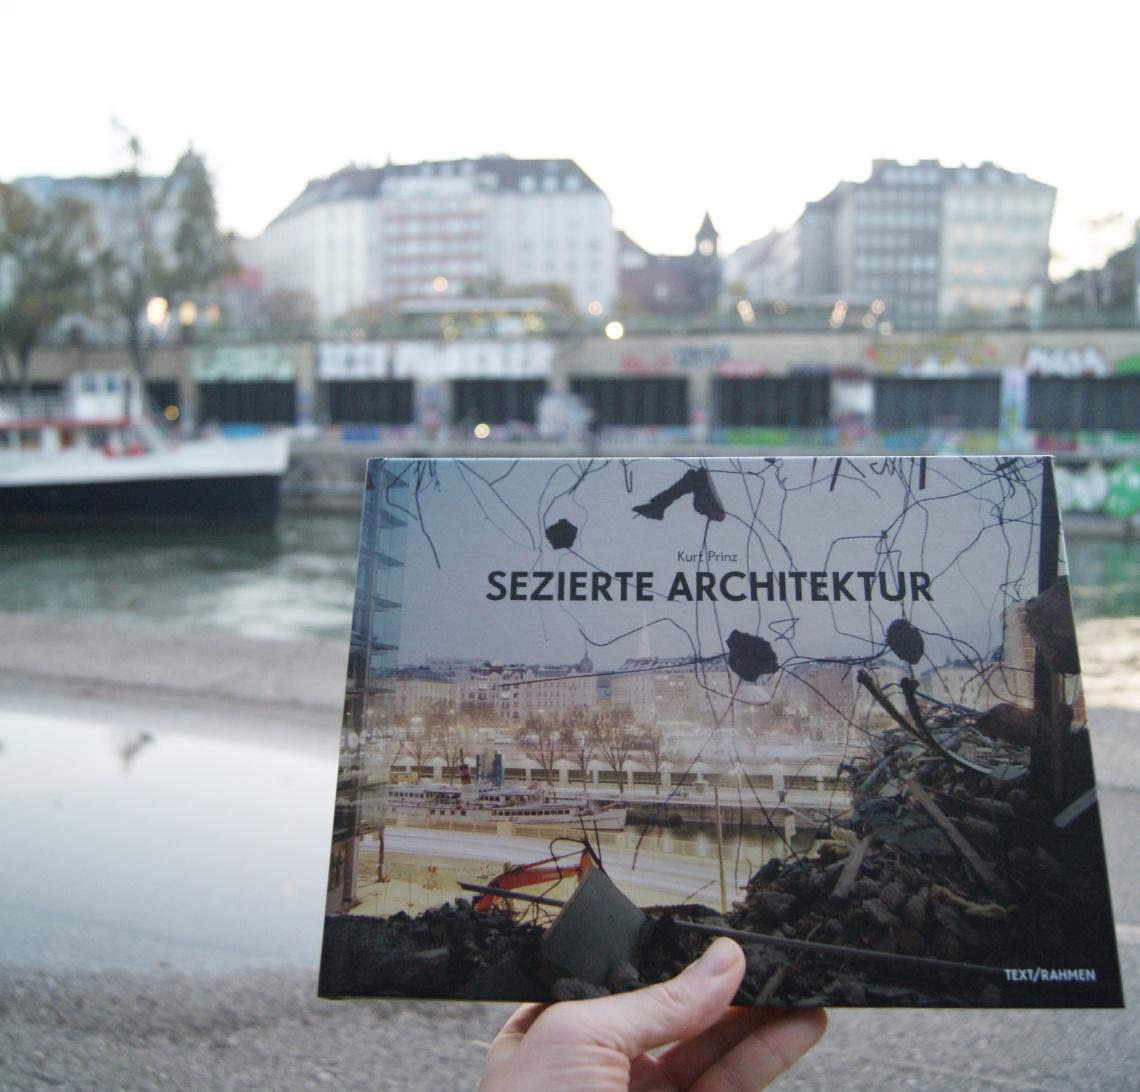 37-sezierte-architektur